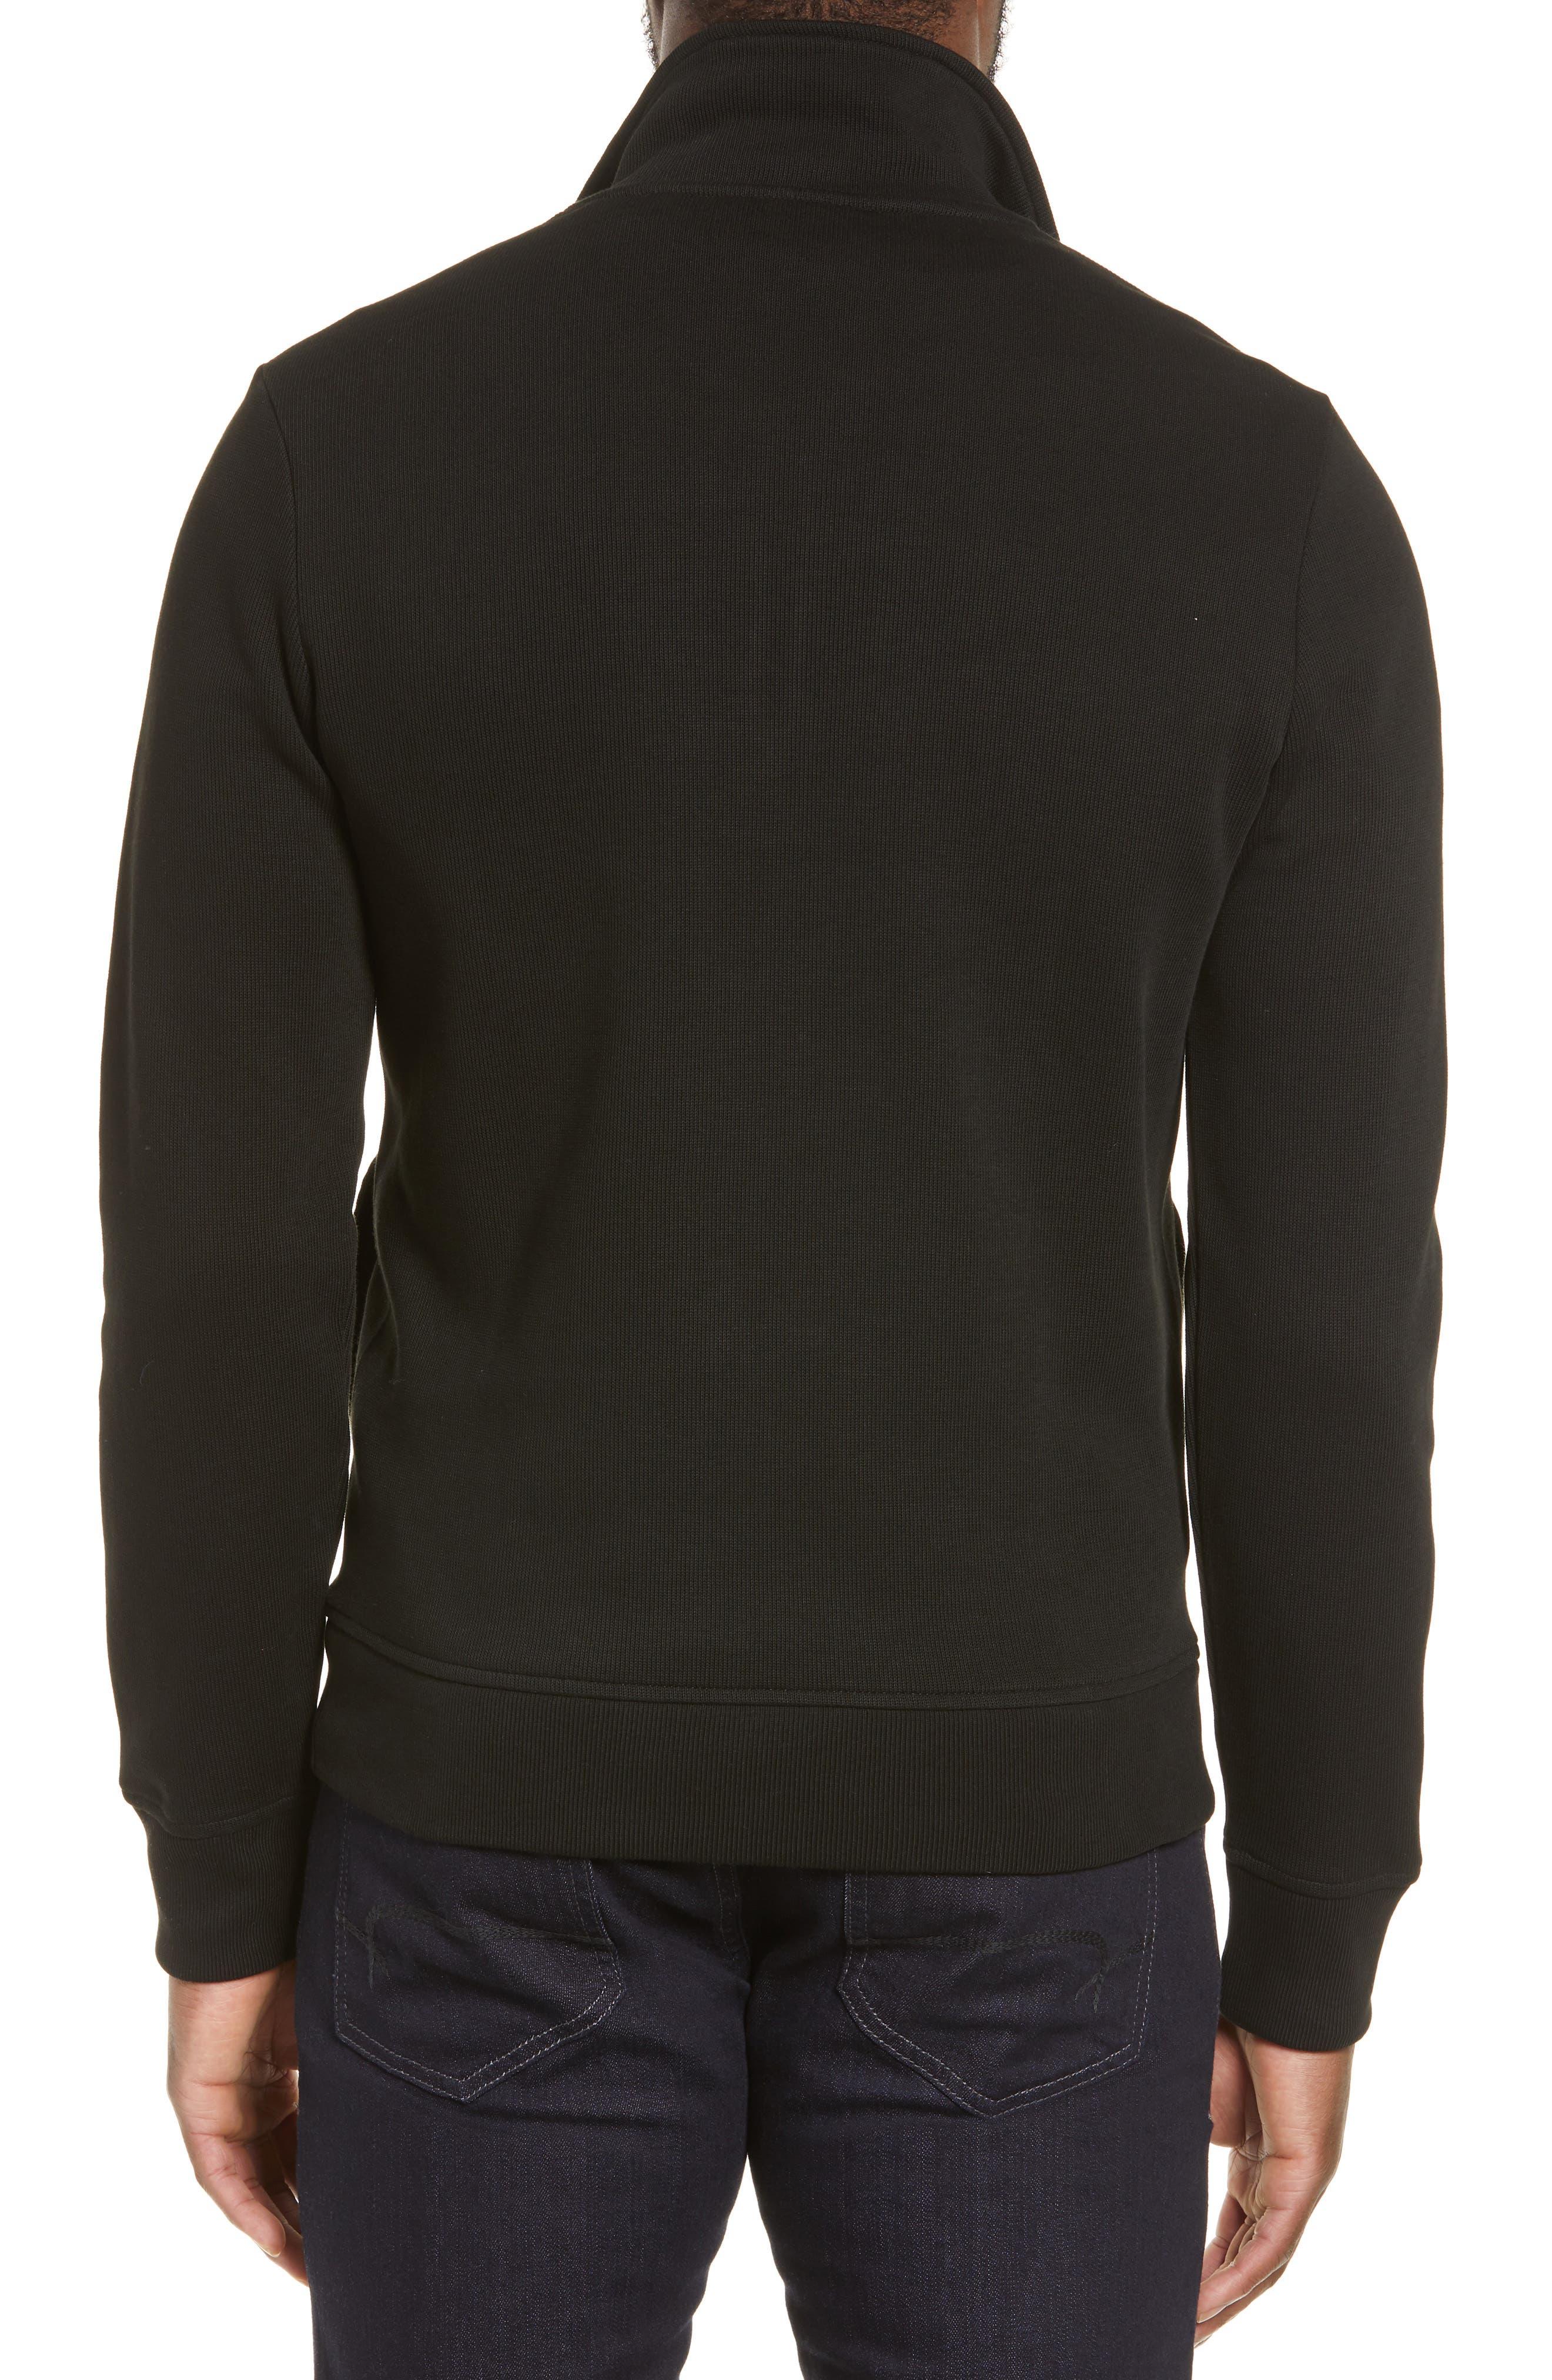 LACOSTE,                             Quarter Zip Pullover,                             Alternate thumbnail 2, color,                             BLACK/ NAVY BLUE